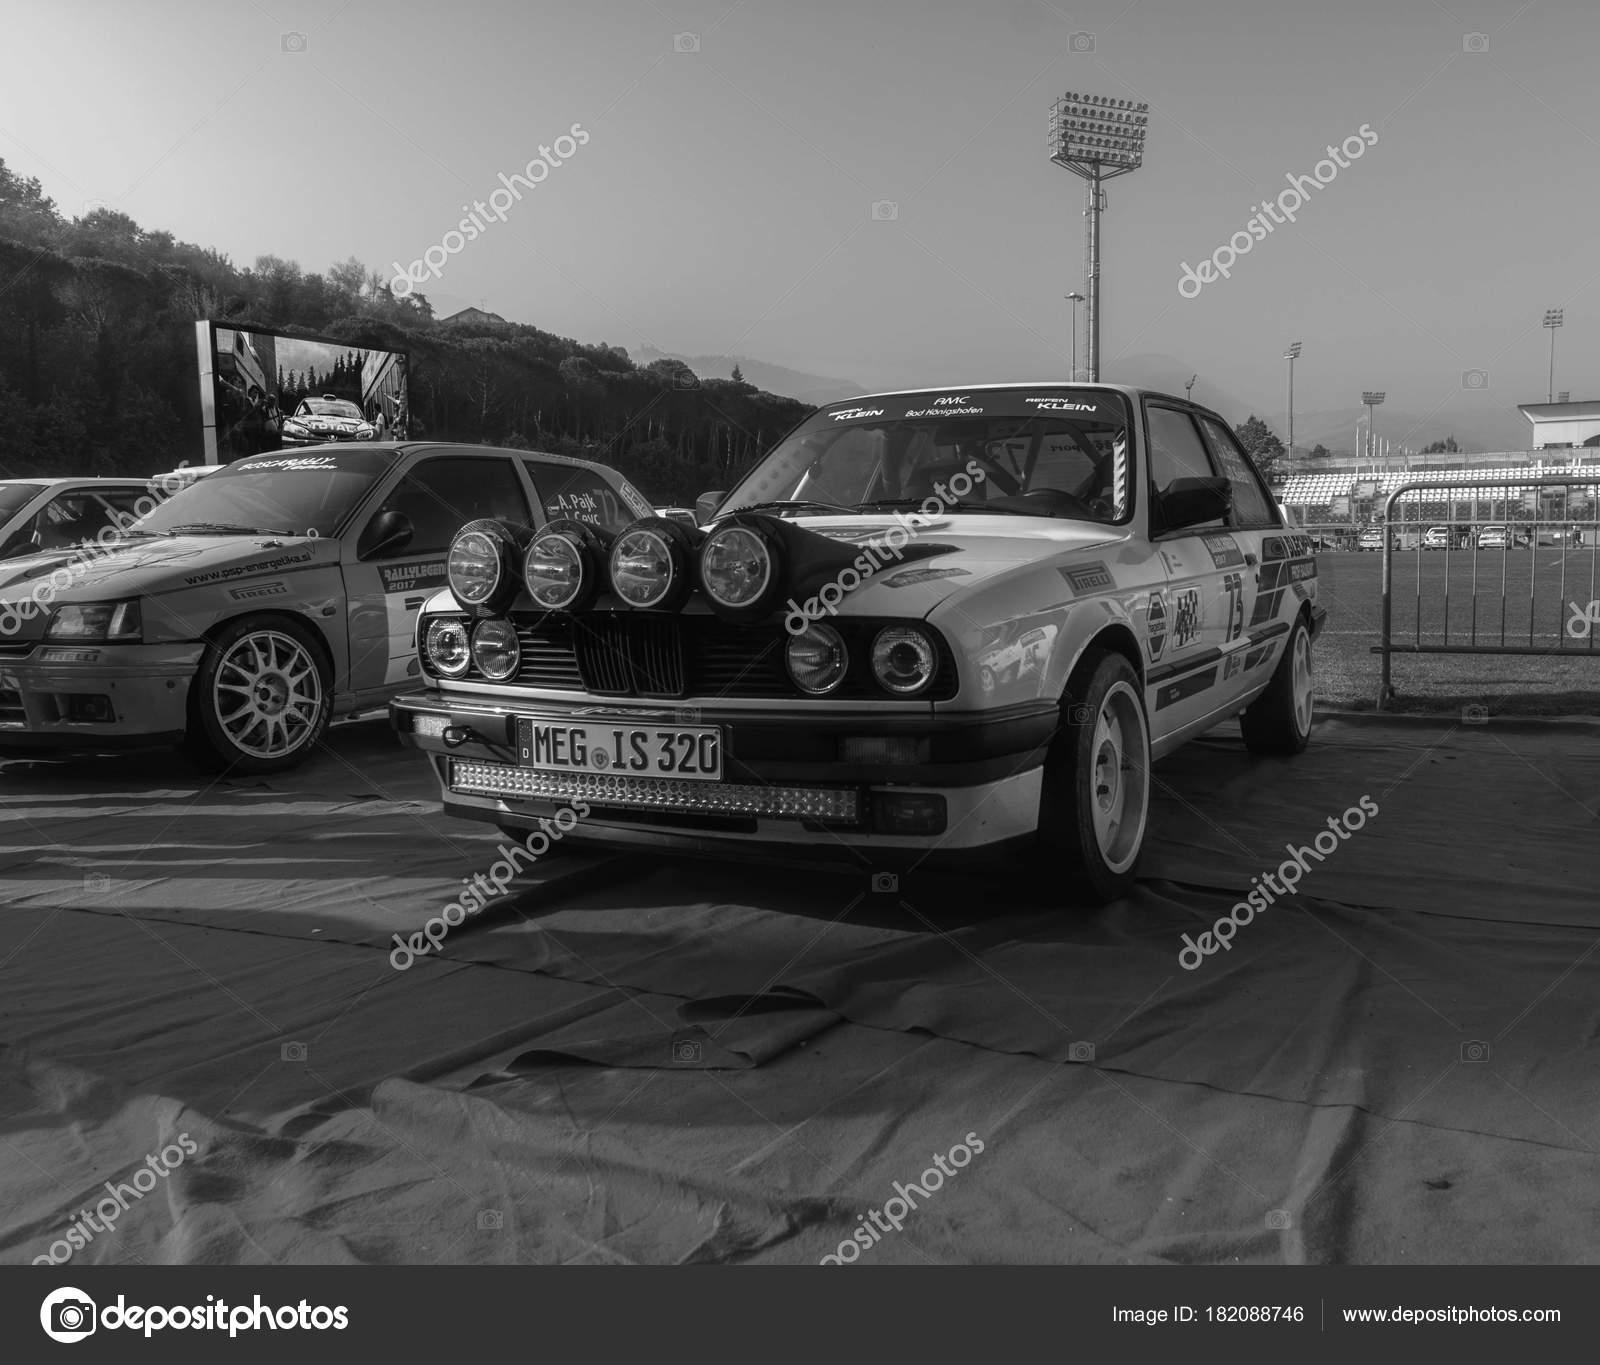 Sanmarino Sanmarino Ott 2017 Bmw E30 1989 Old Racing Car – Stock ...